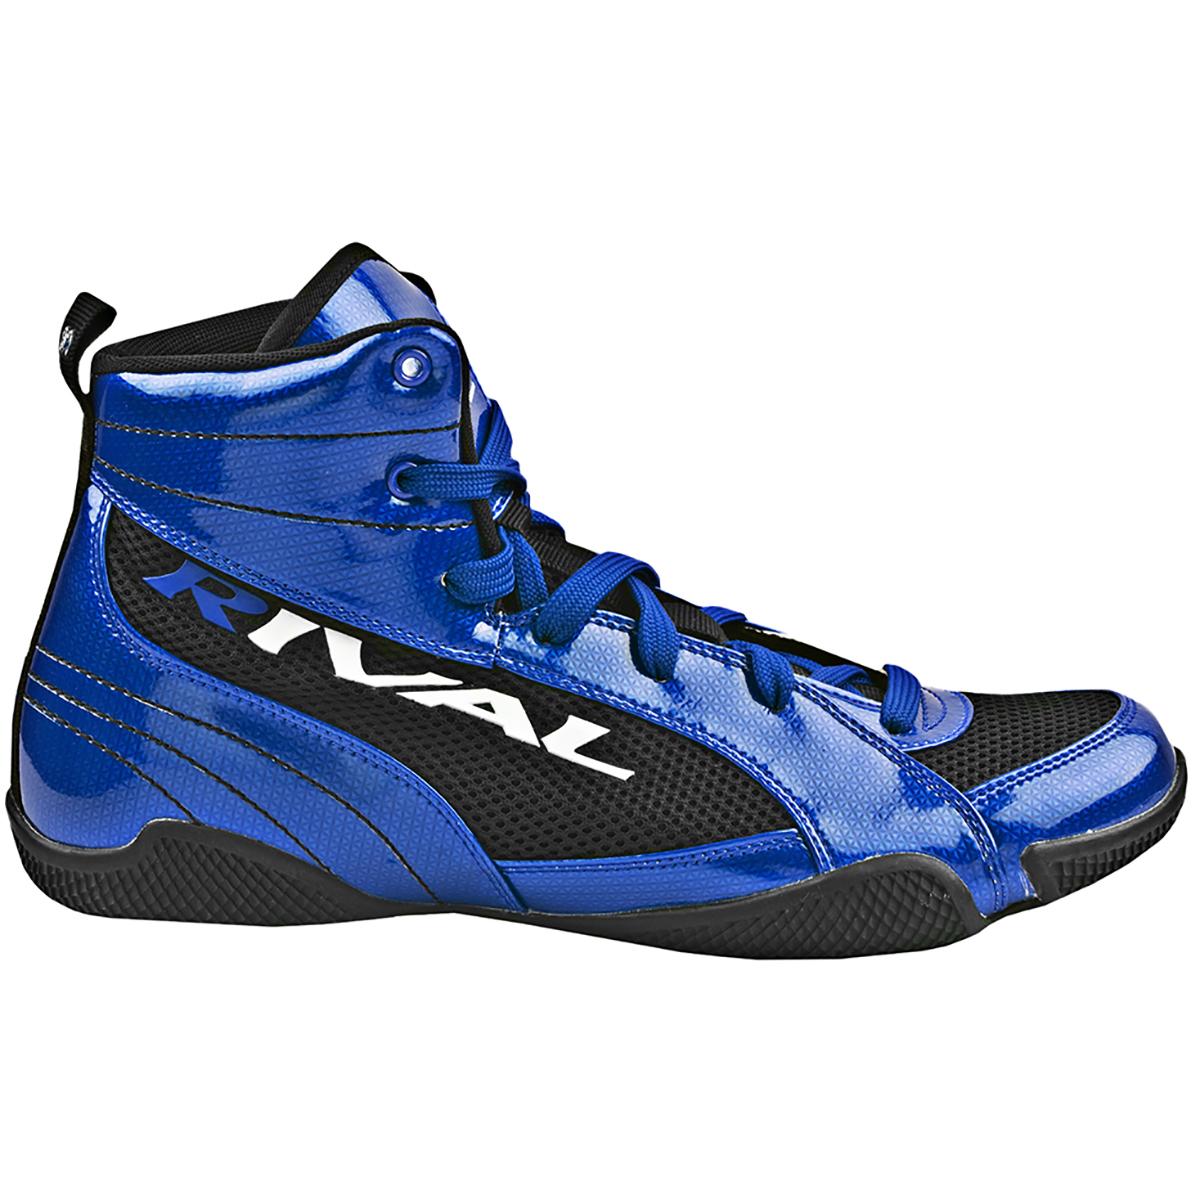 Rival Boxing Lo-Top Guerrero Boots - Sapphire Blue